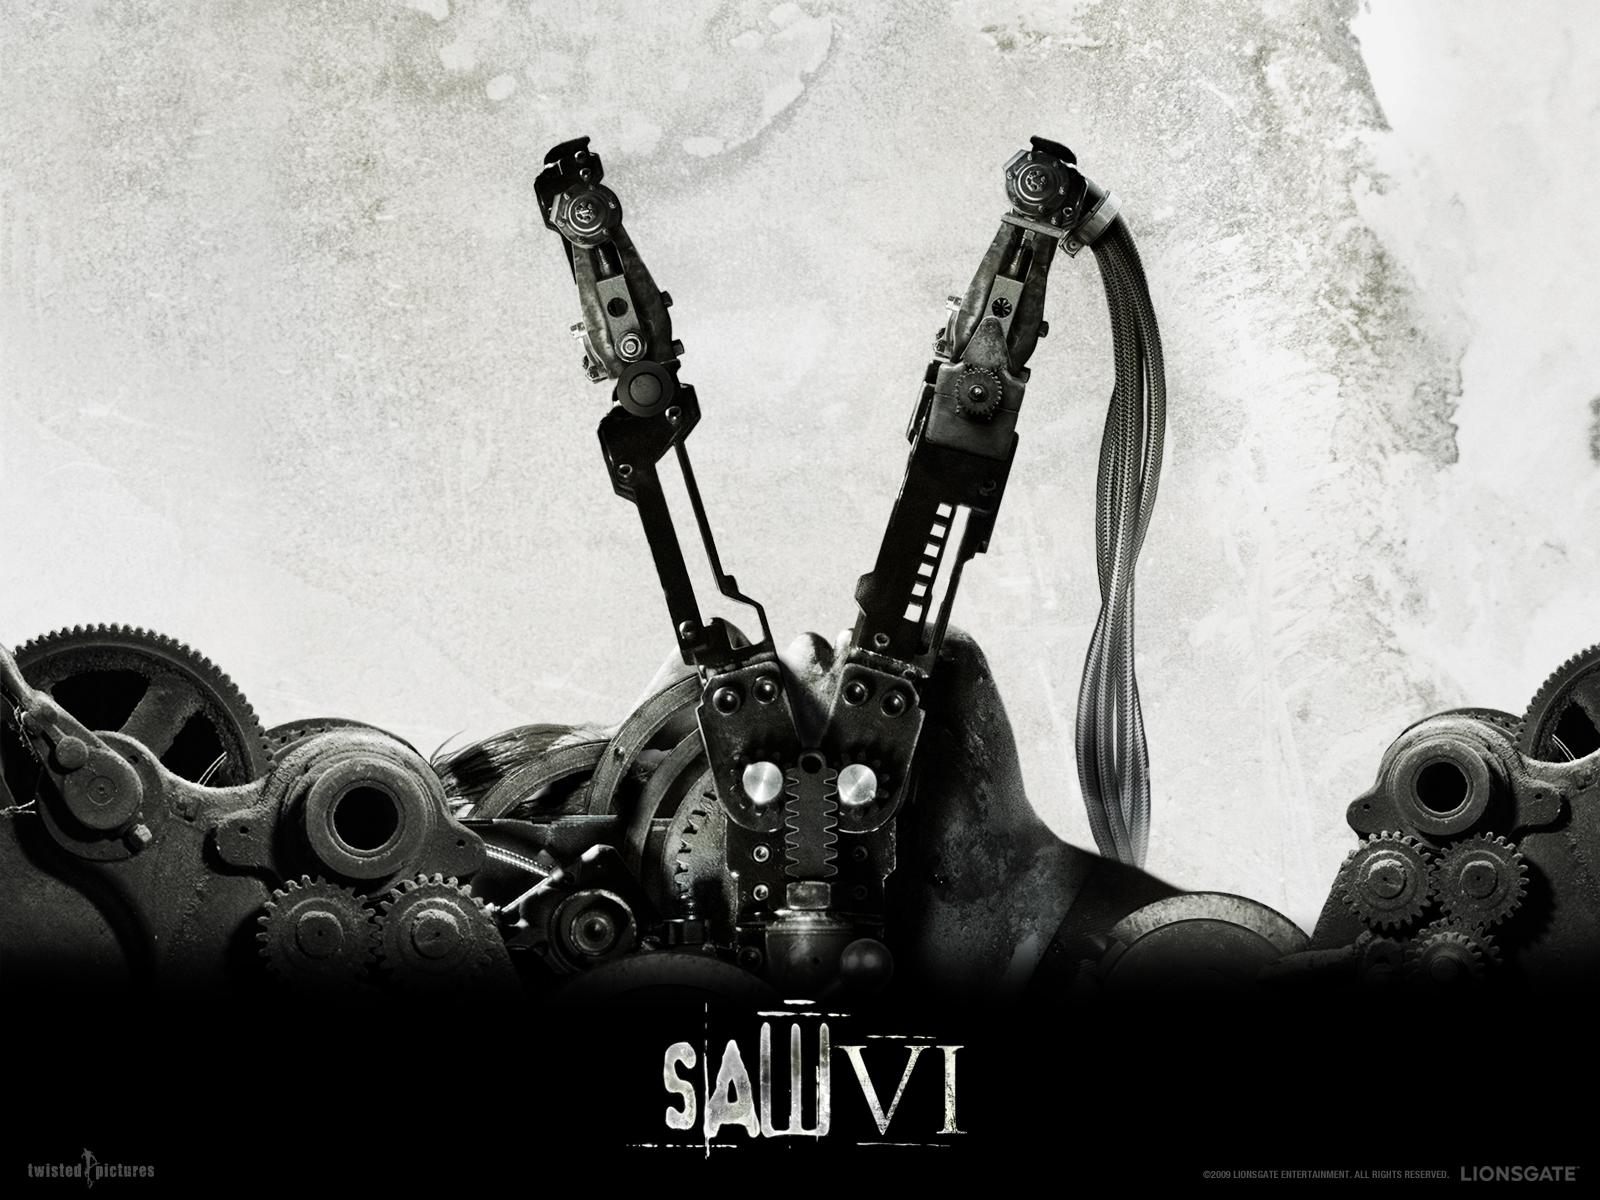 http://4.bp.blogspot.com/_EAViqbzwc_s/TO9HhALF1TI/AAAAAAAACgI/59SYyoQMJmc/s1600/1256710464_1600x1200_saw-vi-2009-movie-wallpaper.jpg